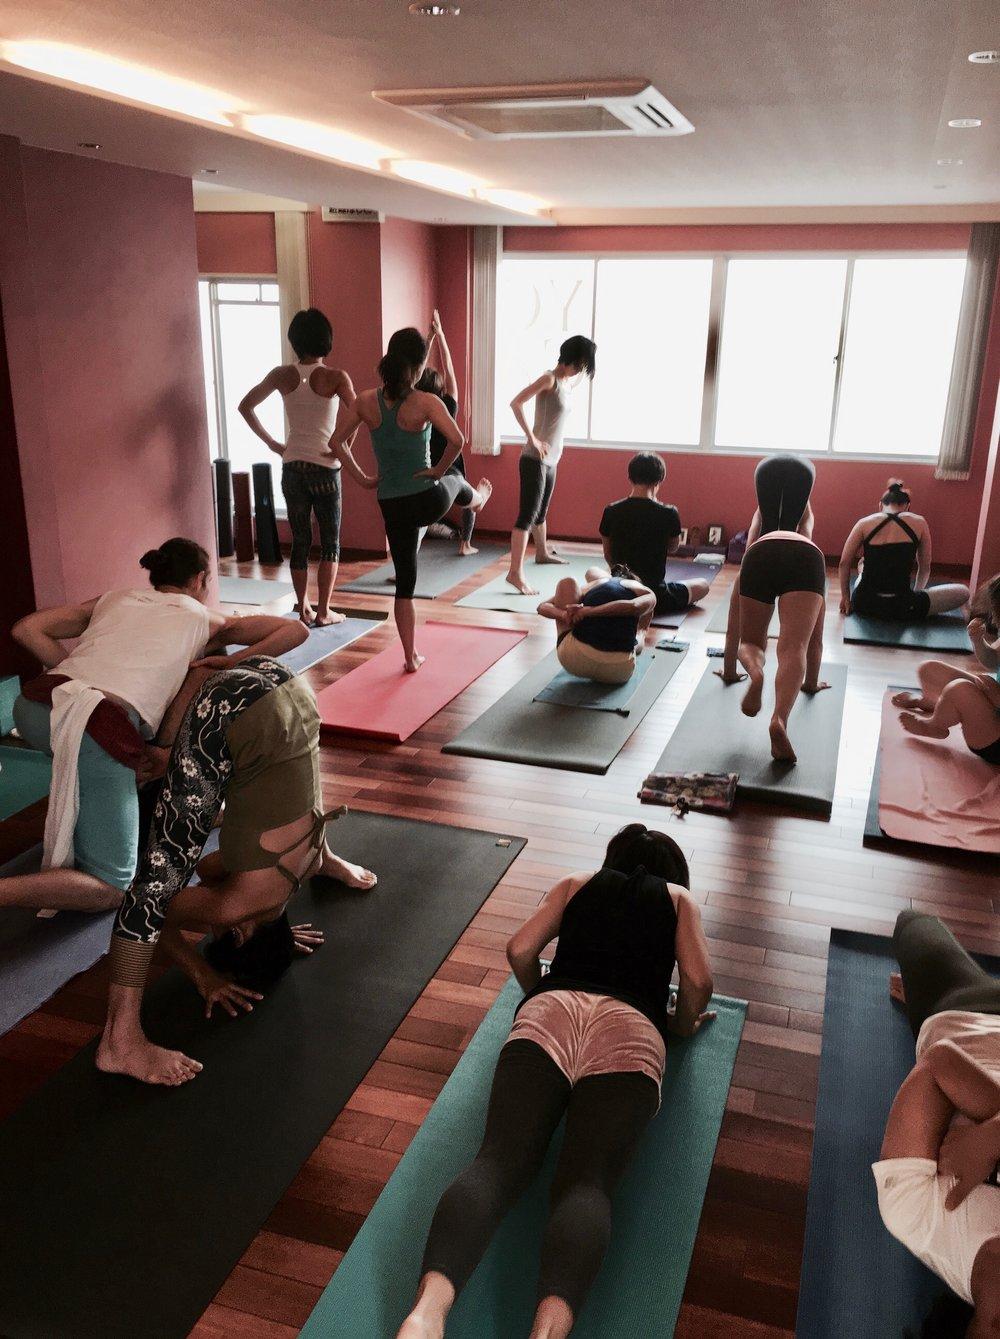 Mysore class in Kobe, Japan